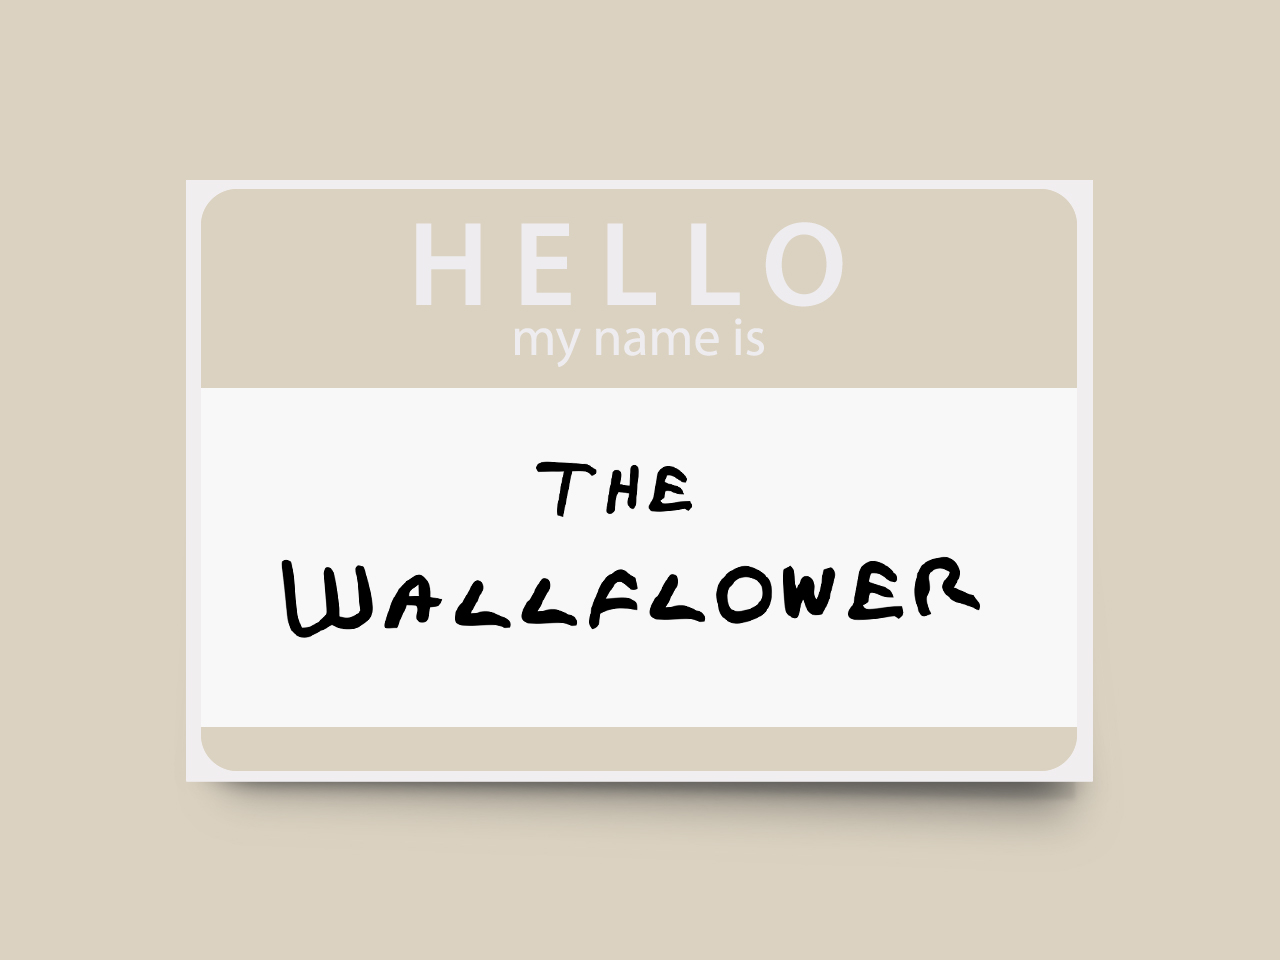 Ventobot_HelloMyNameIsSticker_Wallflower.jpg